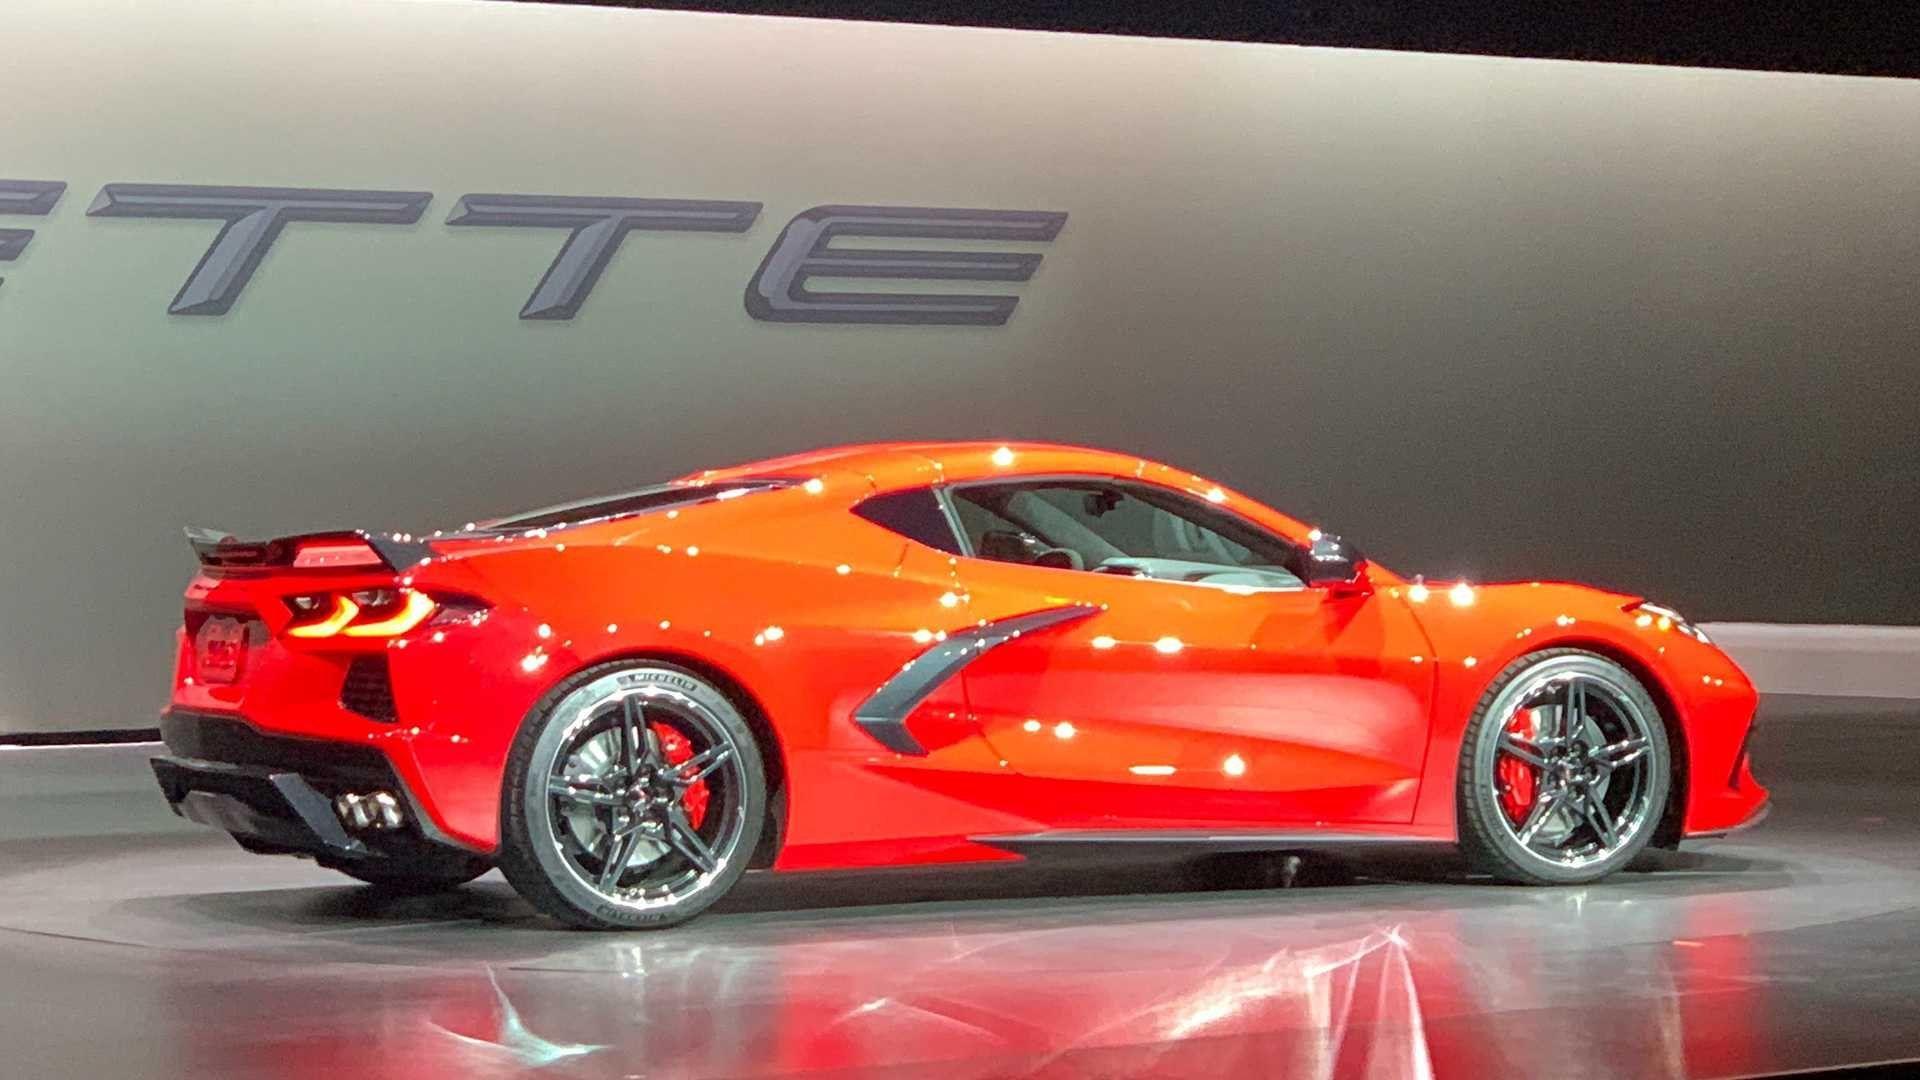 2020 Chevy Corvette Zora Zr1 New Model and Performance